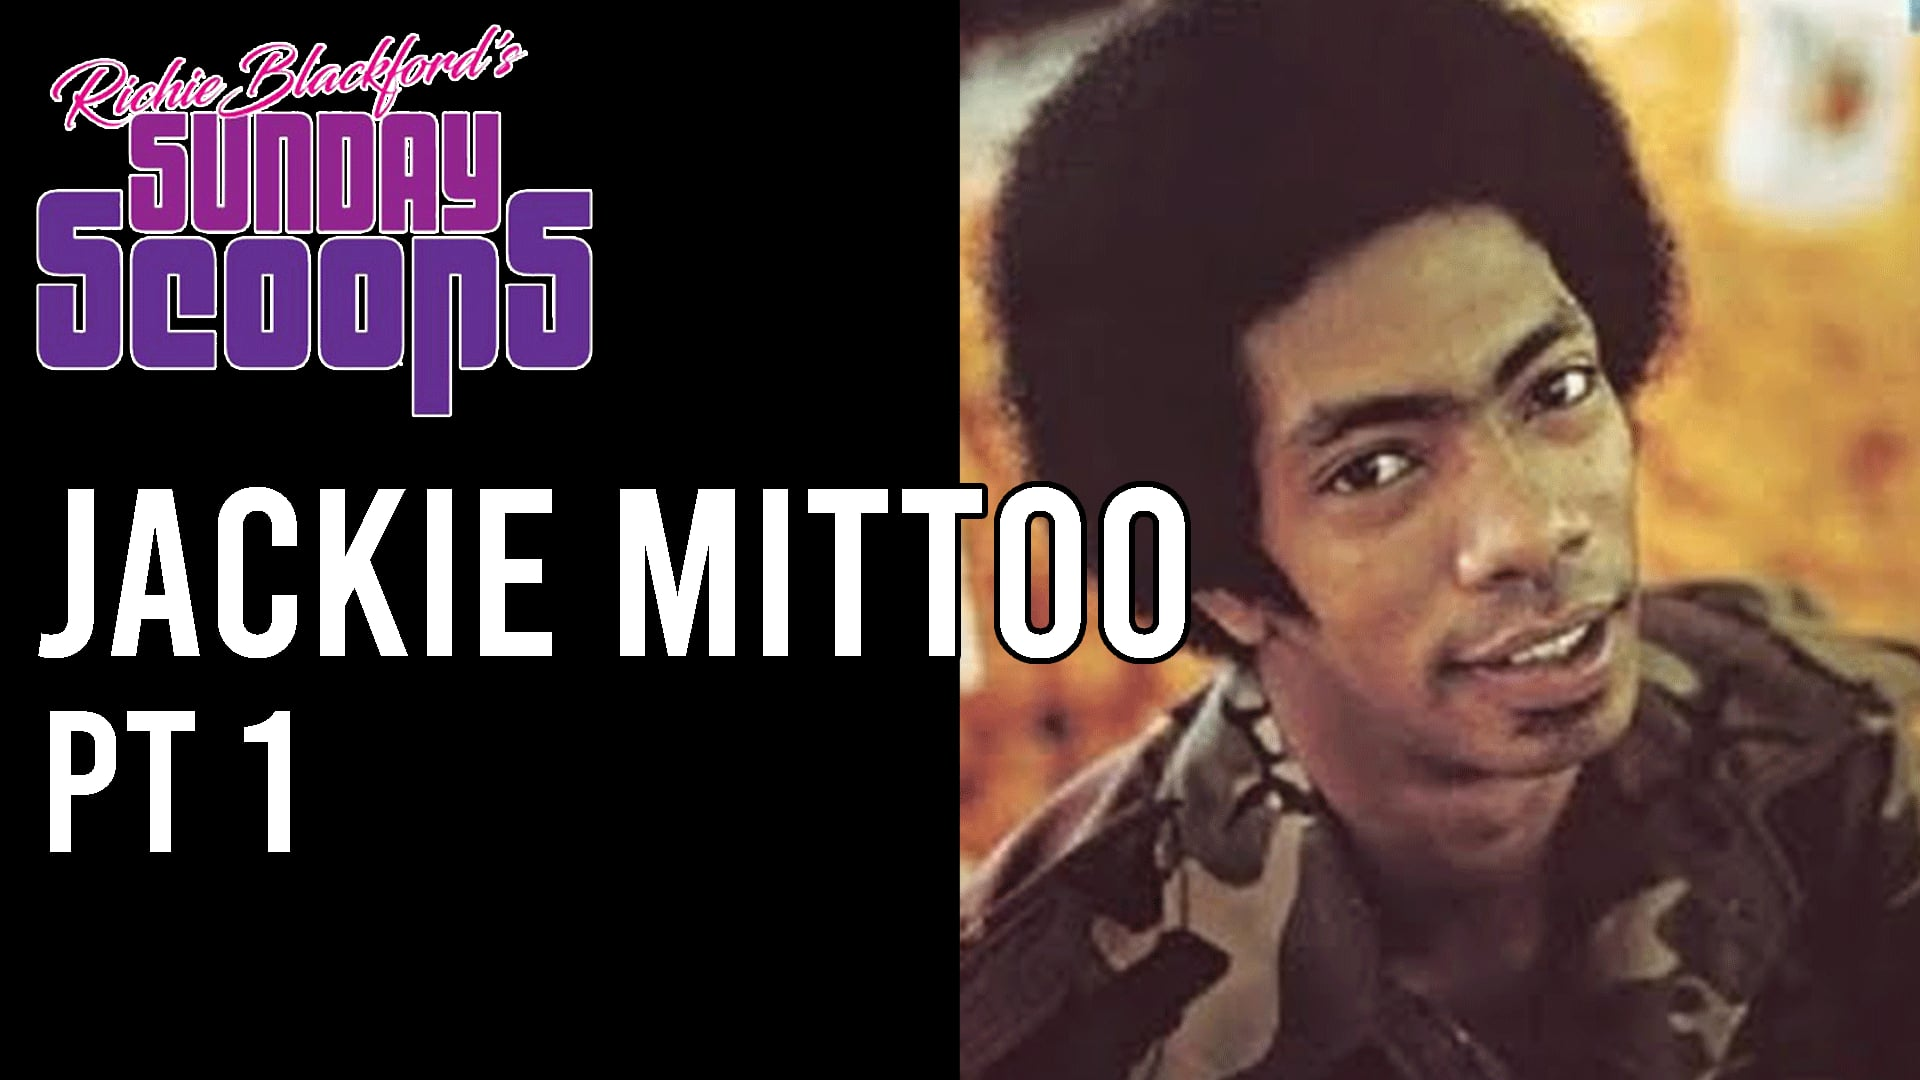 Sunday Scoops Jackie Mittoo pt 1